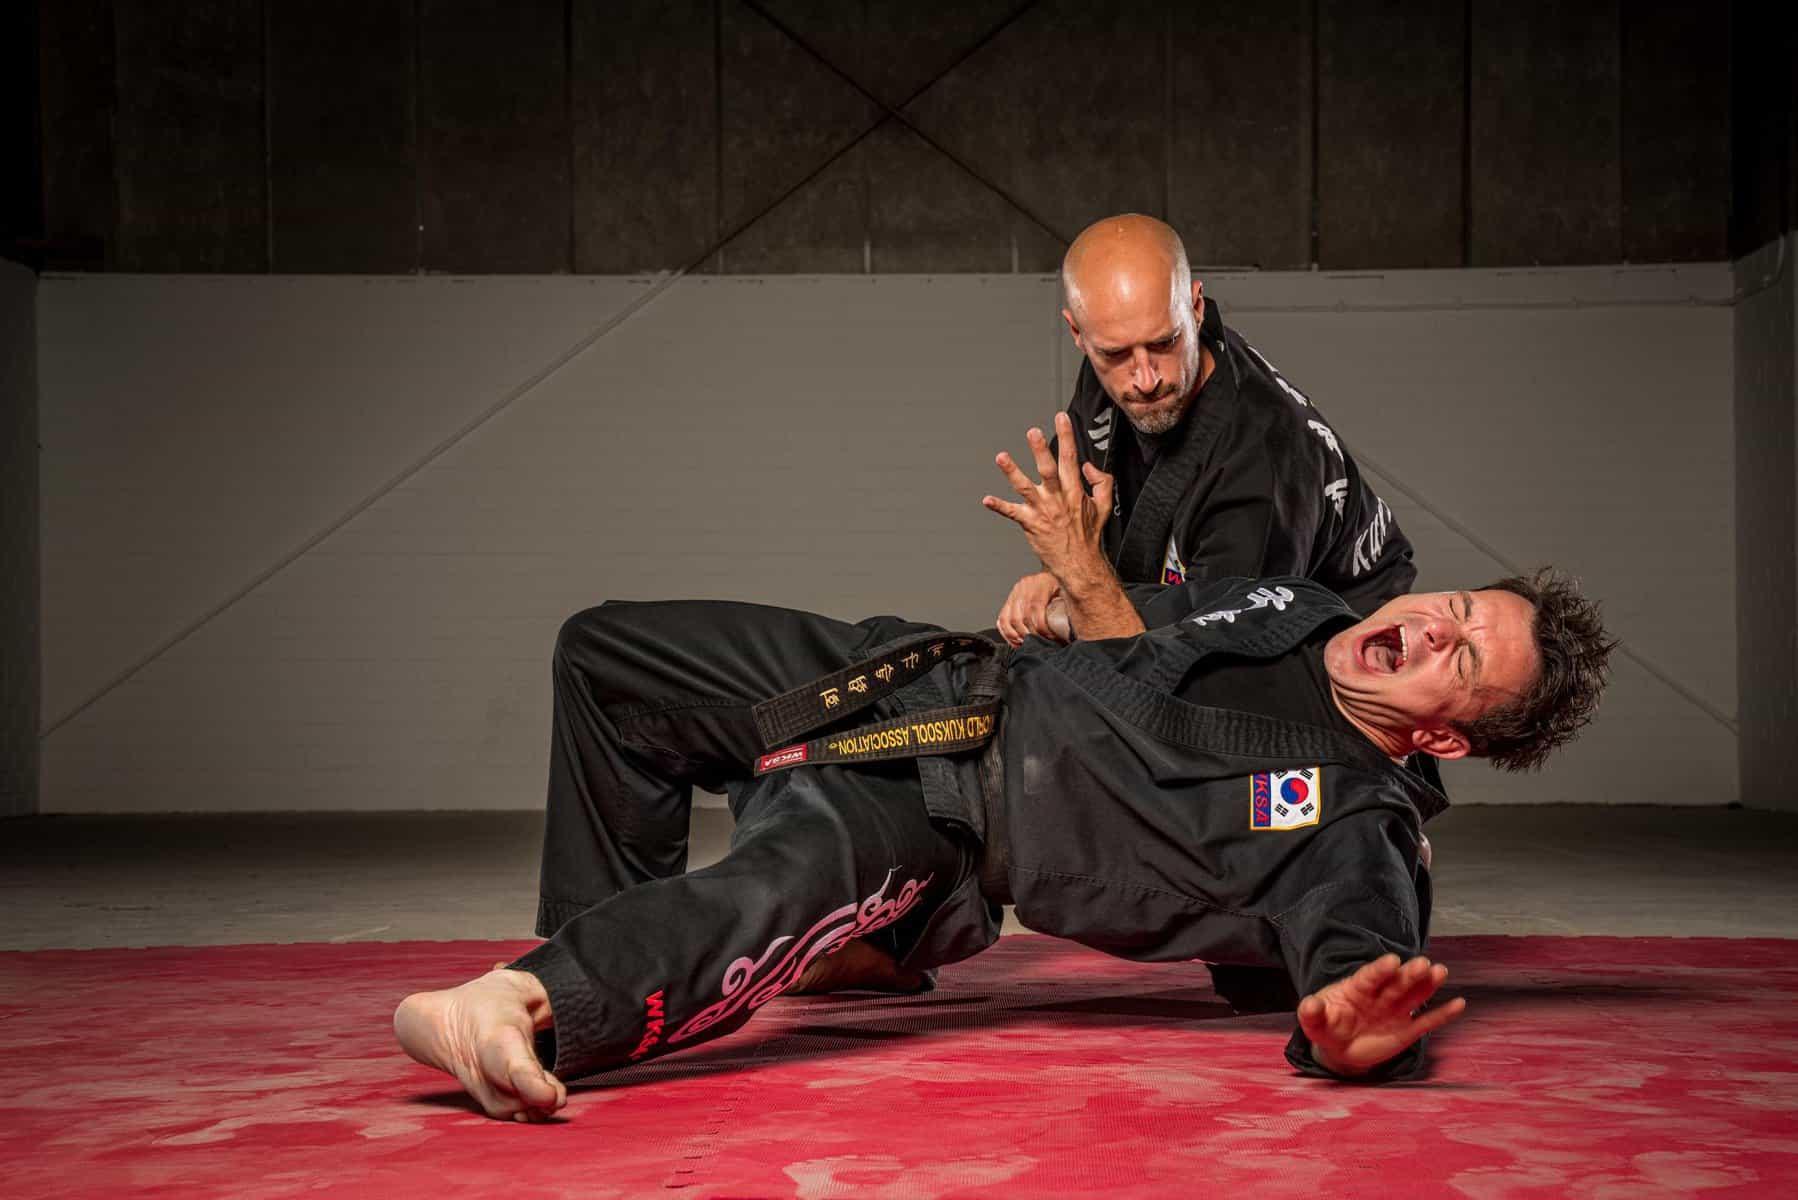 Kuk Sool Won Black belt class Kirkcaldy, Fife